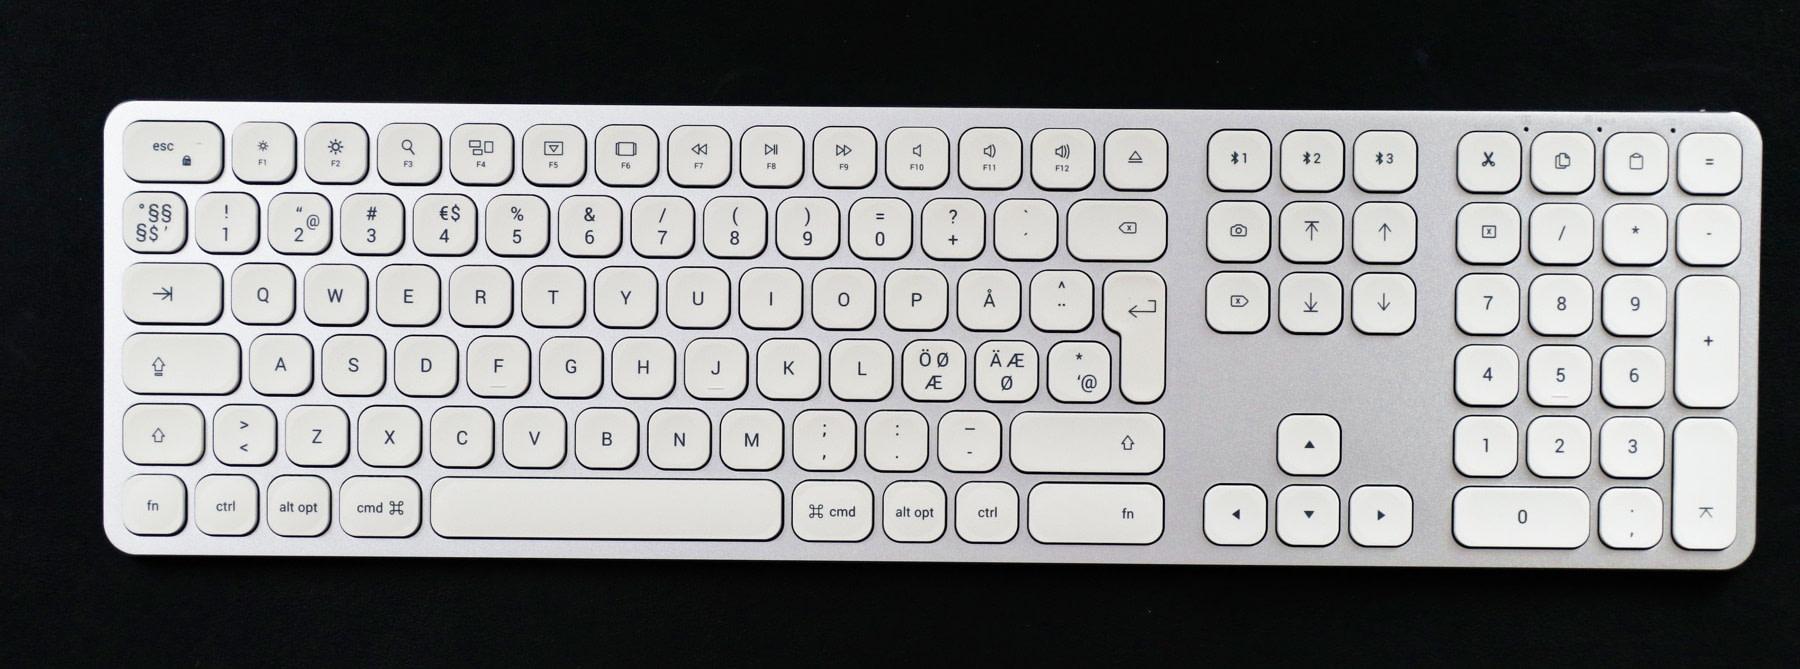 best mac keyboards: satechi